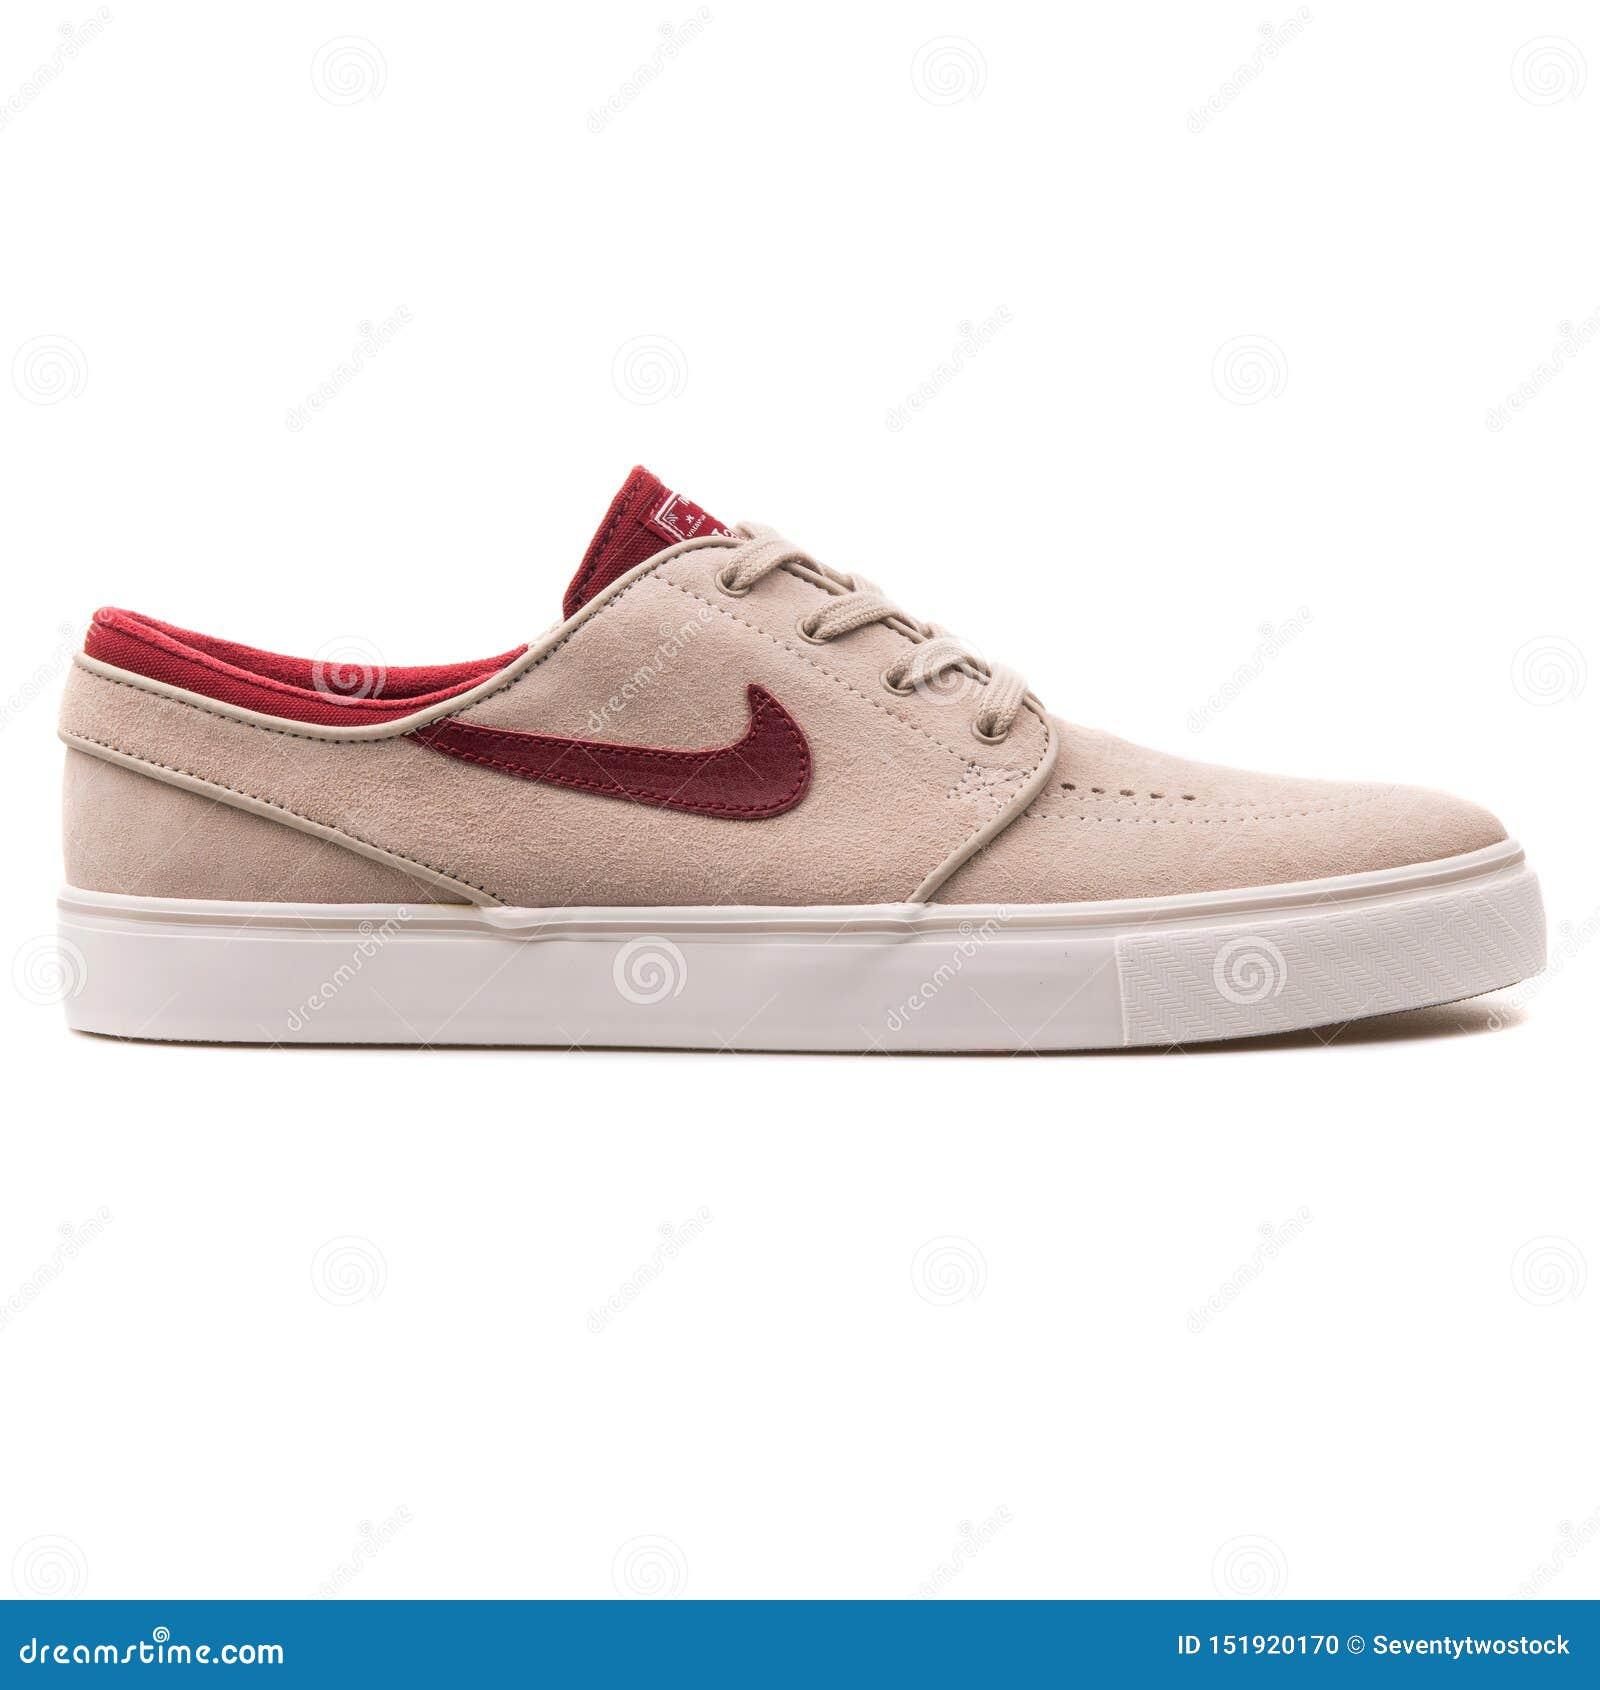 Nike Zoom Stefan Janoski SE Beige And Red Sneaker Editorial Image ...